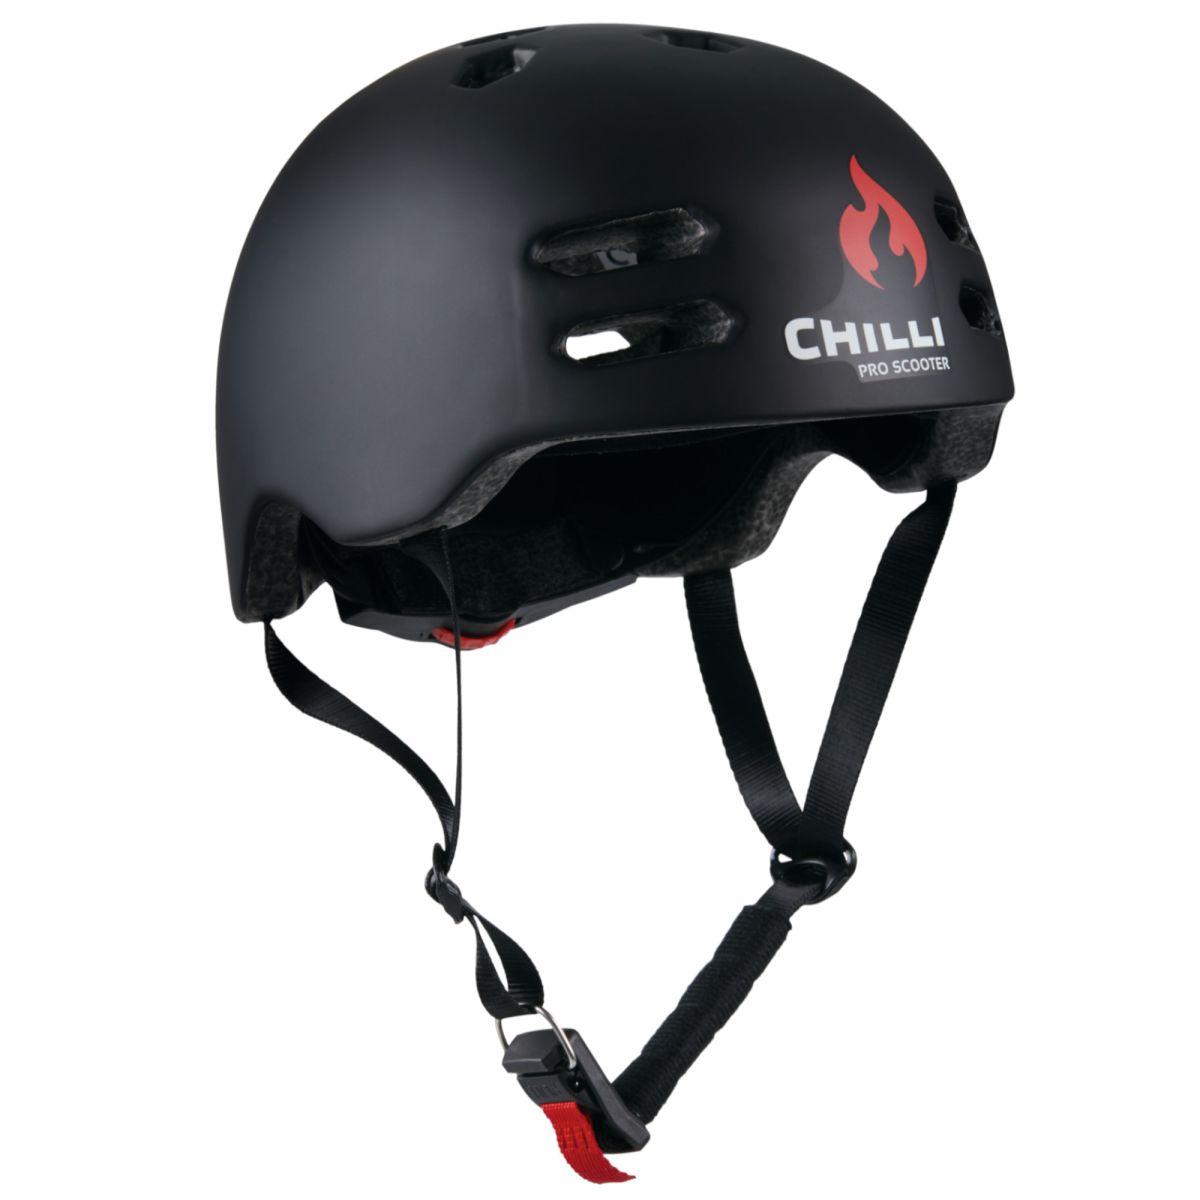 Obrázek Chilli helma Inmold černá L (58-61 cm)